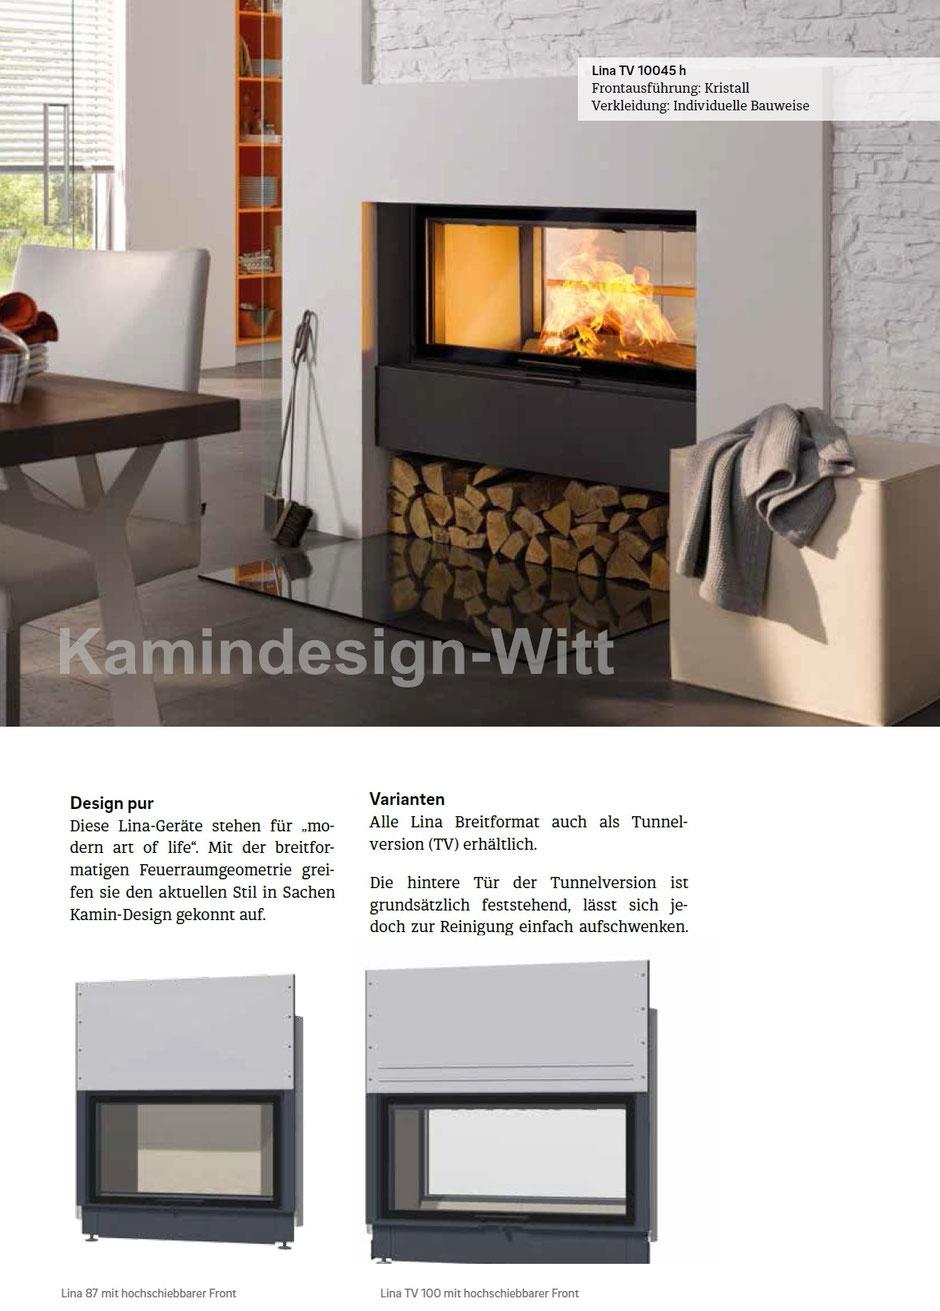 Schmid-Lina-120-Kamineinsatz